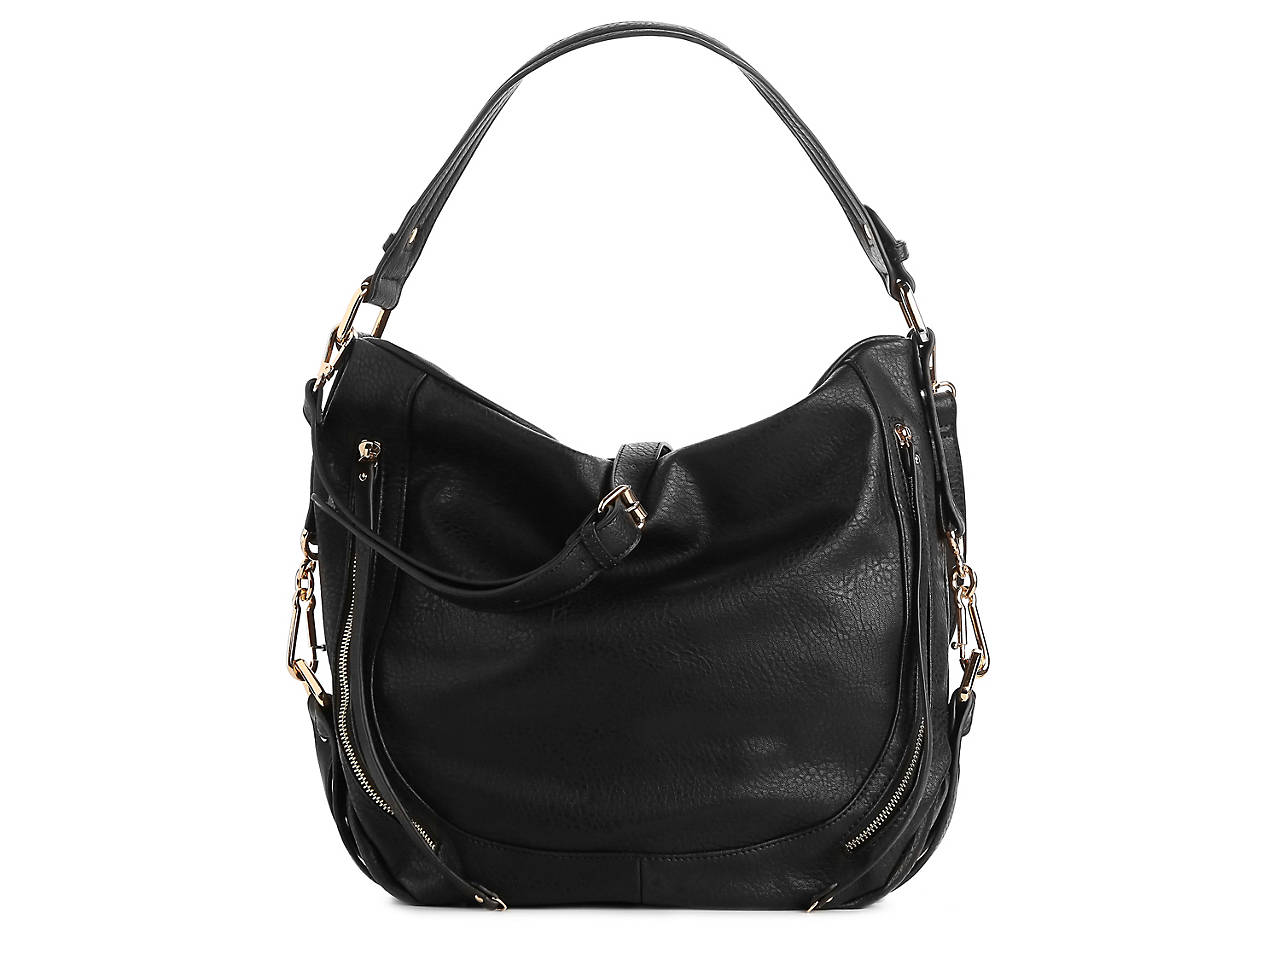 38a8b564b5 Urban Expressions Jessie Hobo Bag Women s Handbags   Accessories